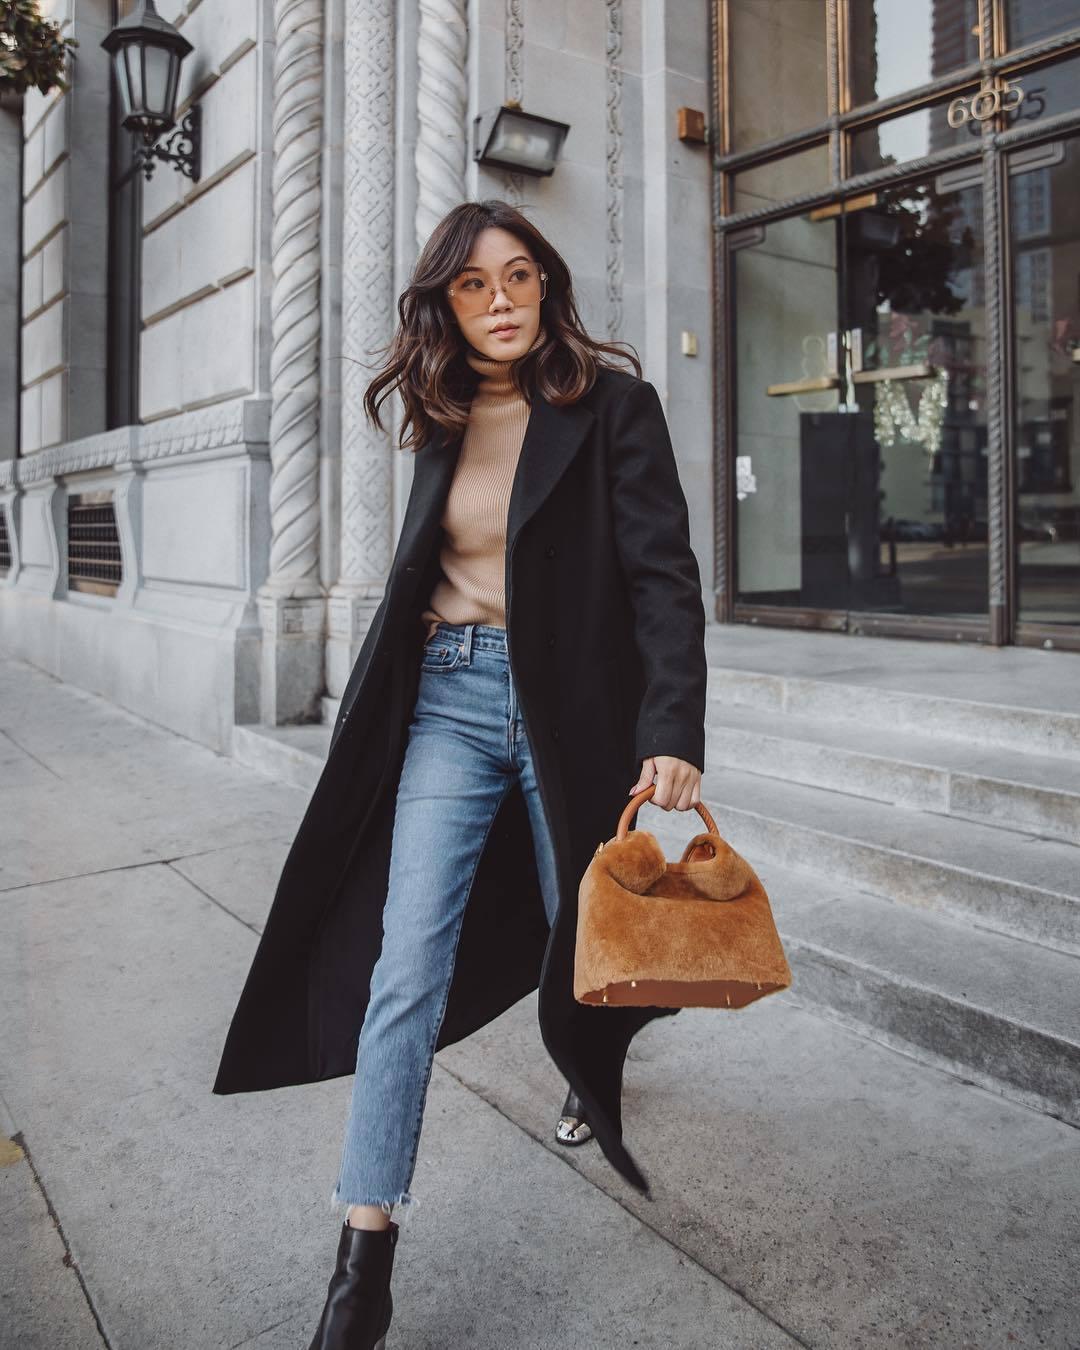 bag brown bag furry bag black boots ankle boots cropped jeans black coat turtleneck sweater